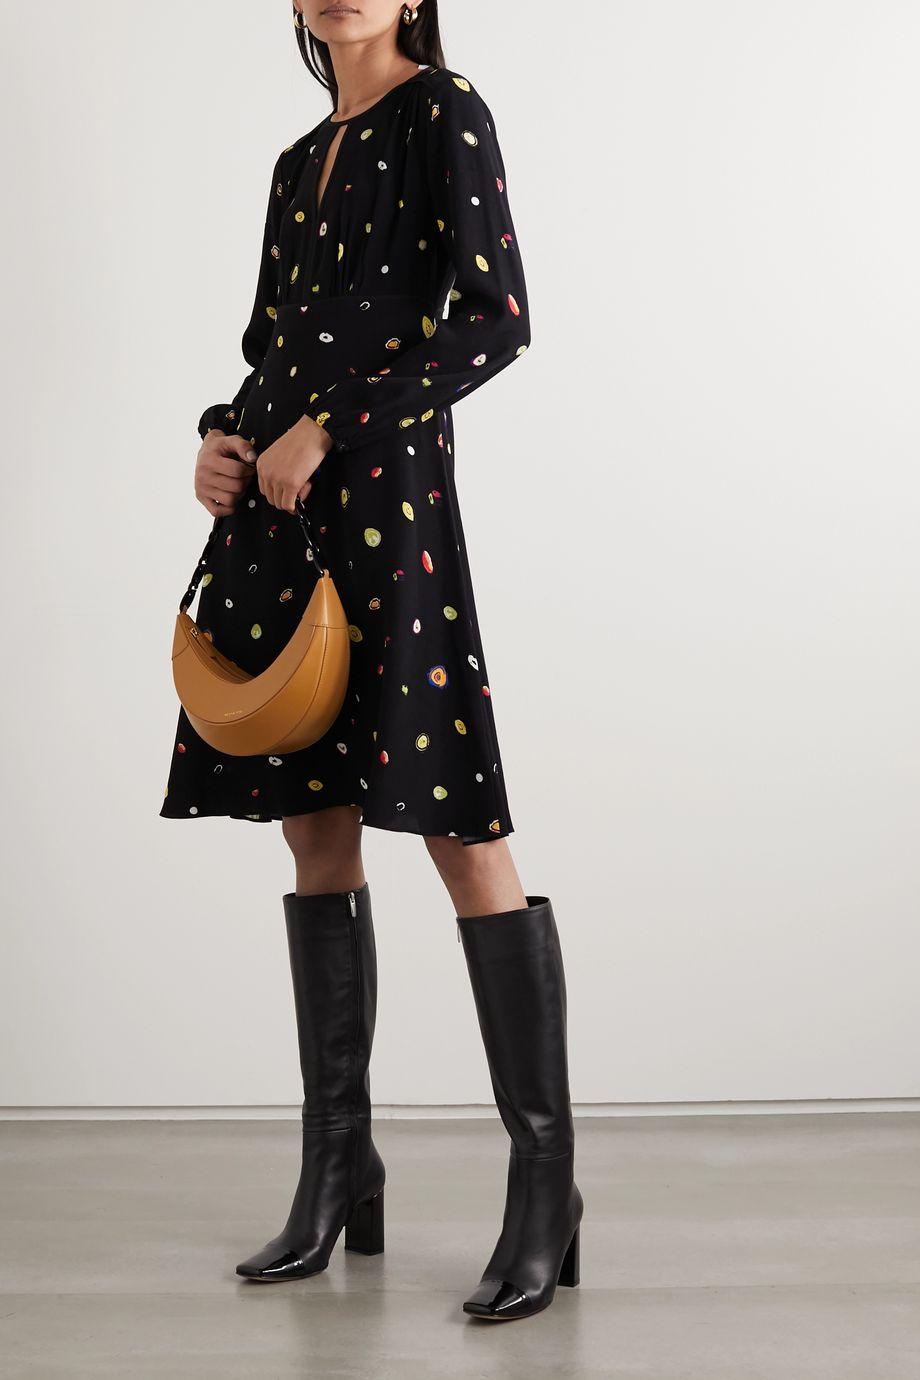 Diane von Furstenberg Andrea printed crepe dress